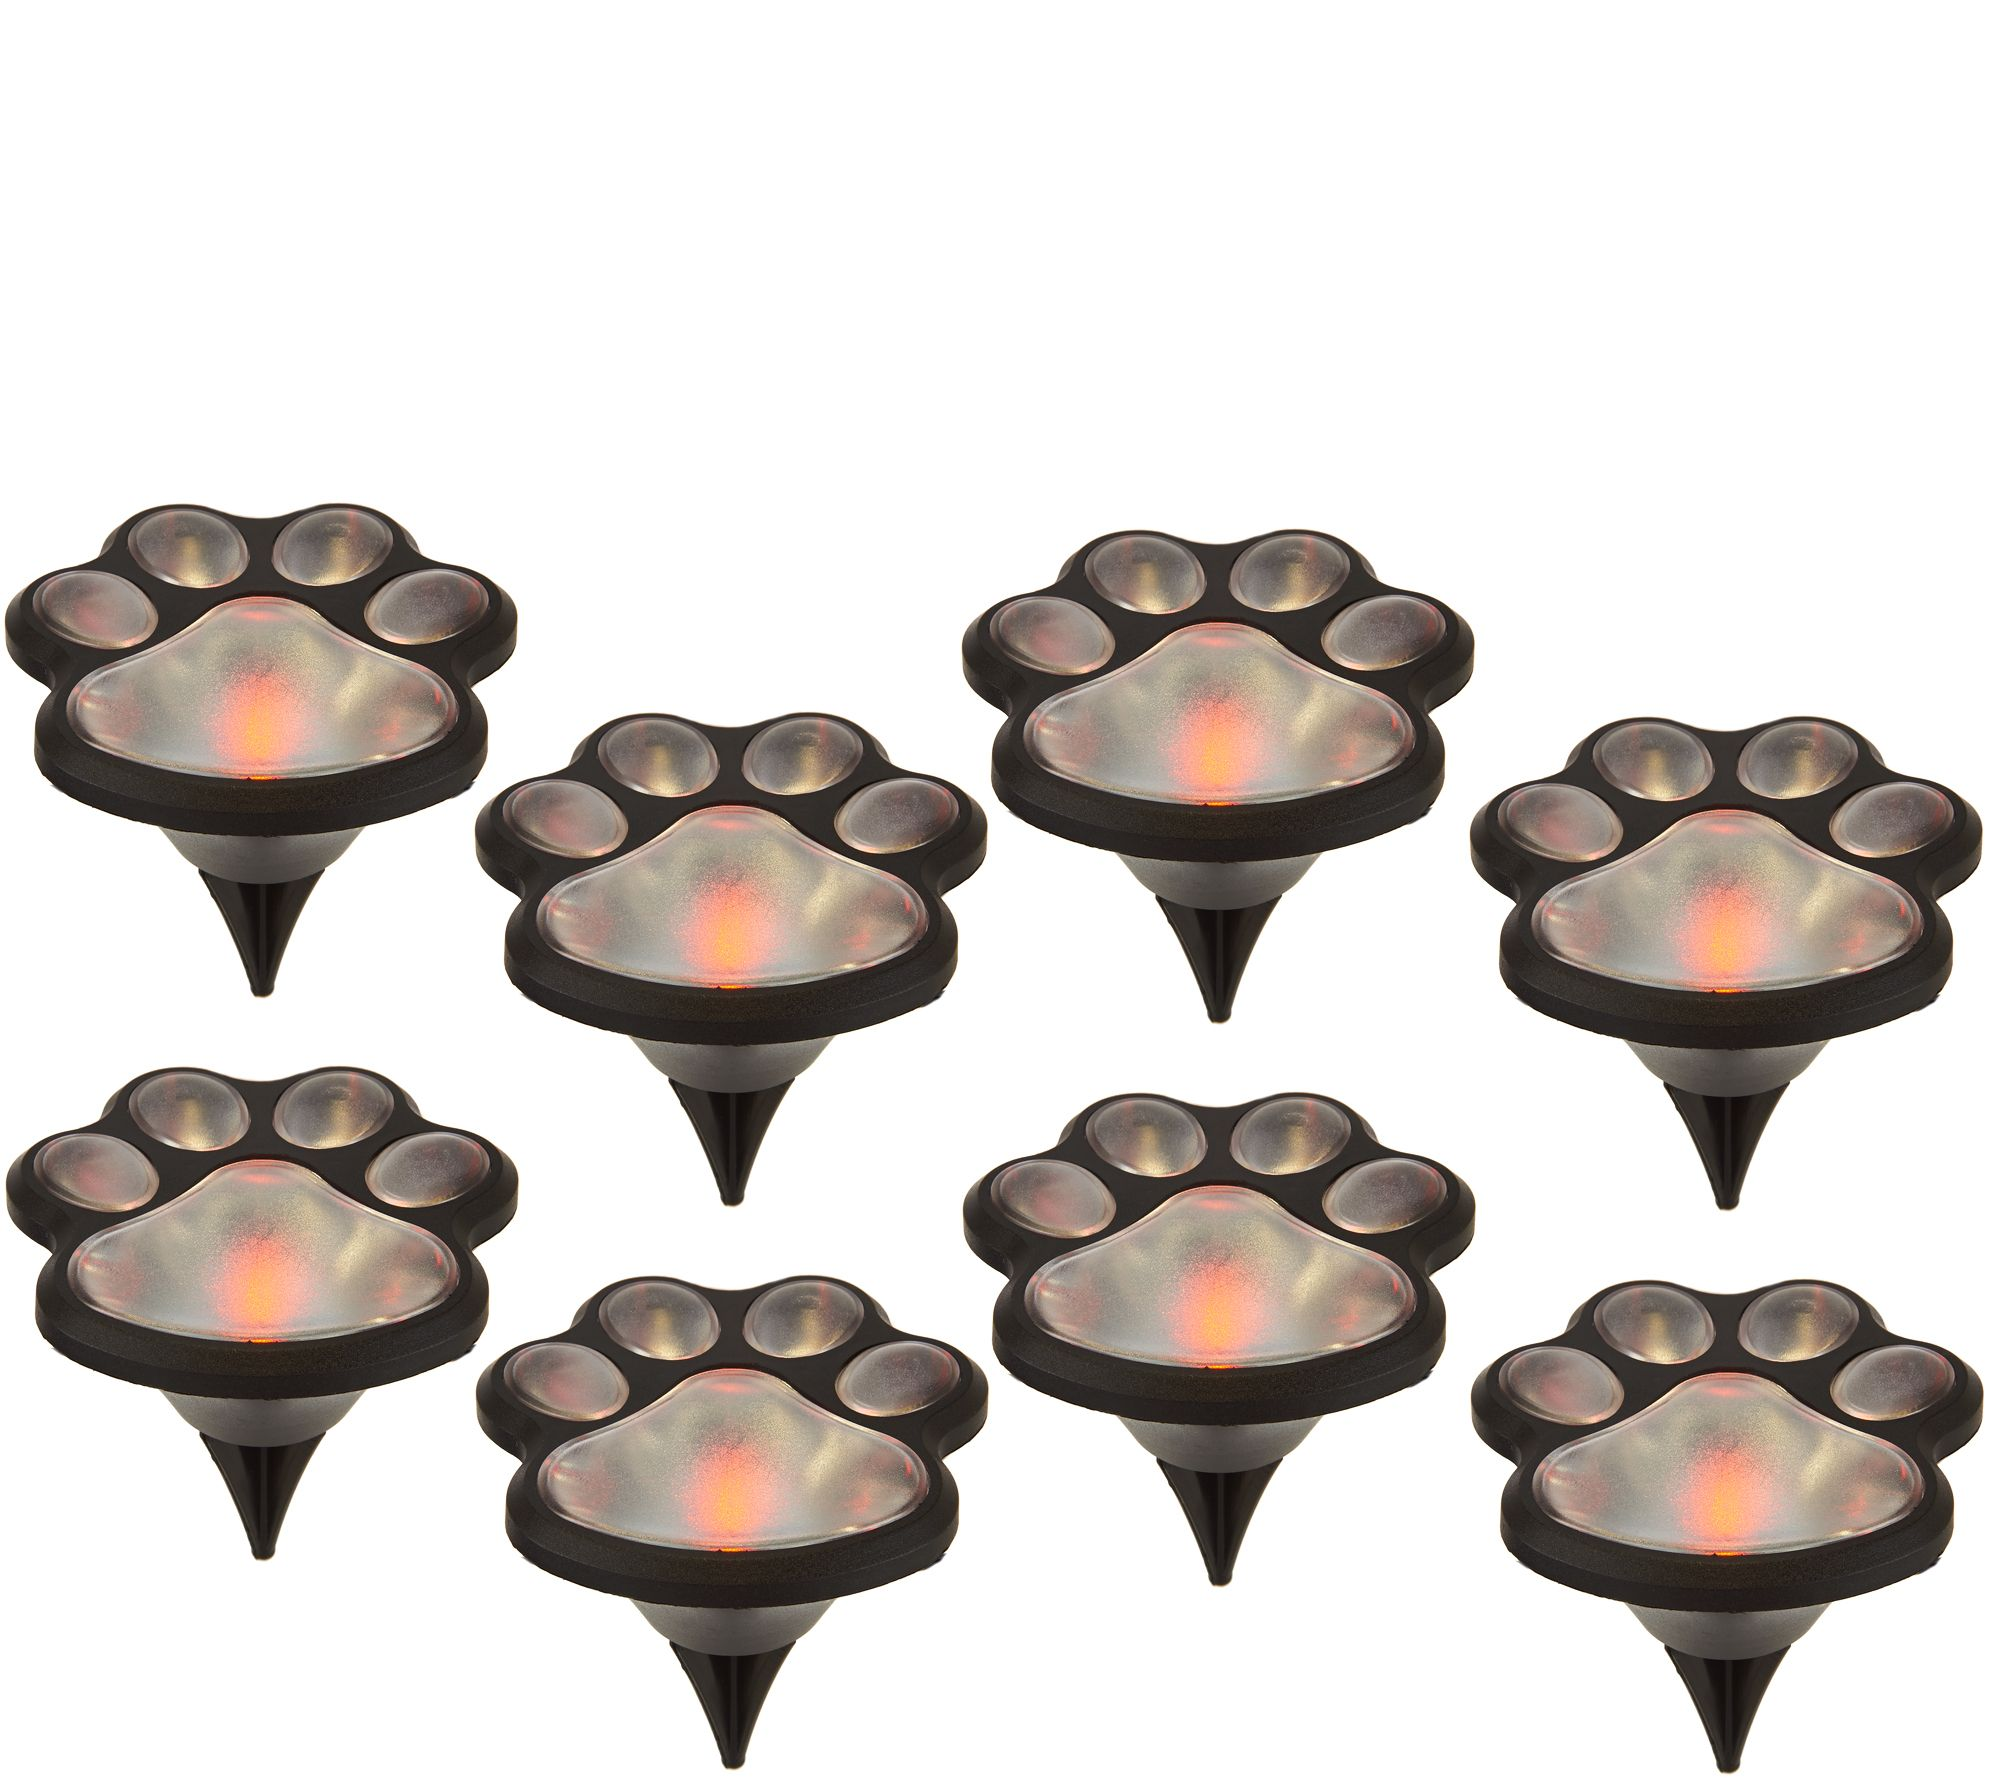 Garden Lights Qvc : Set of solar powered paw print garden lights page qvc